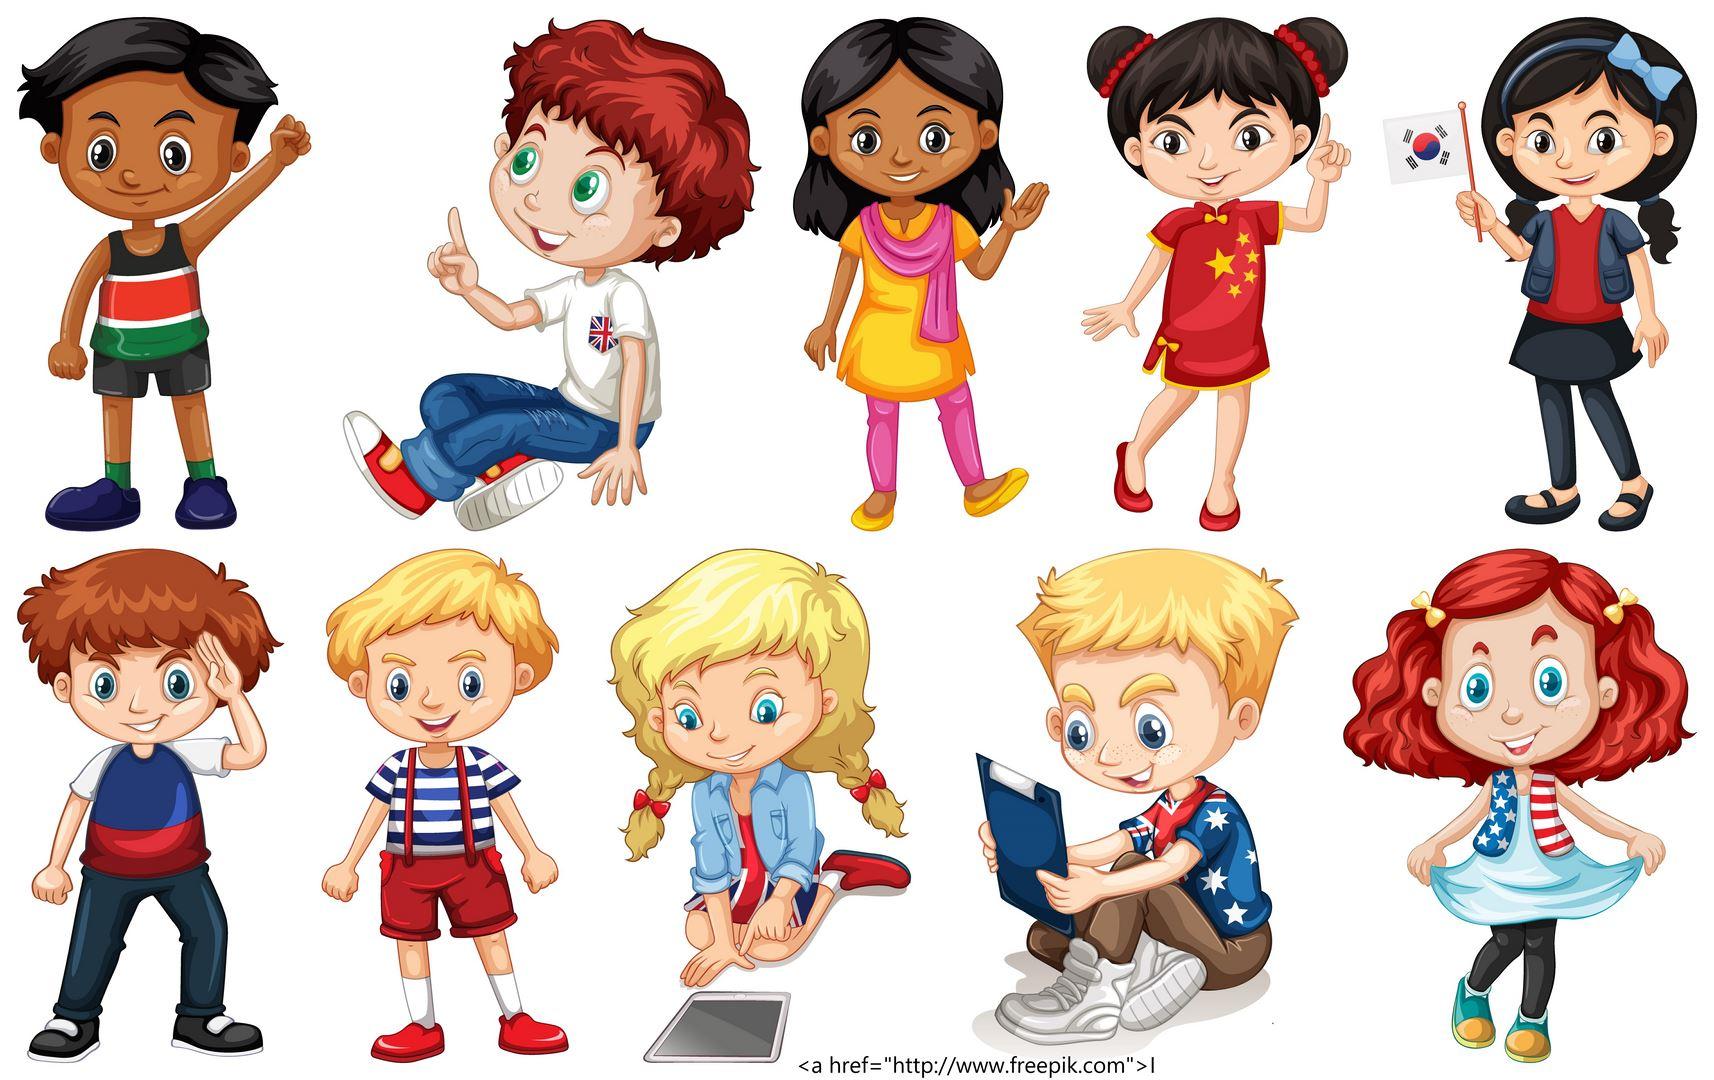 Wtorek 02.06.2020 Temat dnia: Prawa dzieci